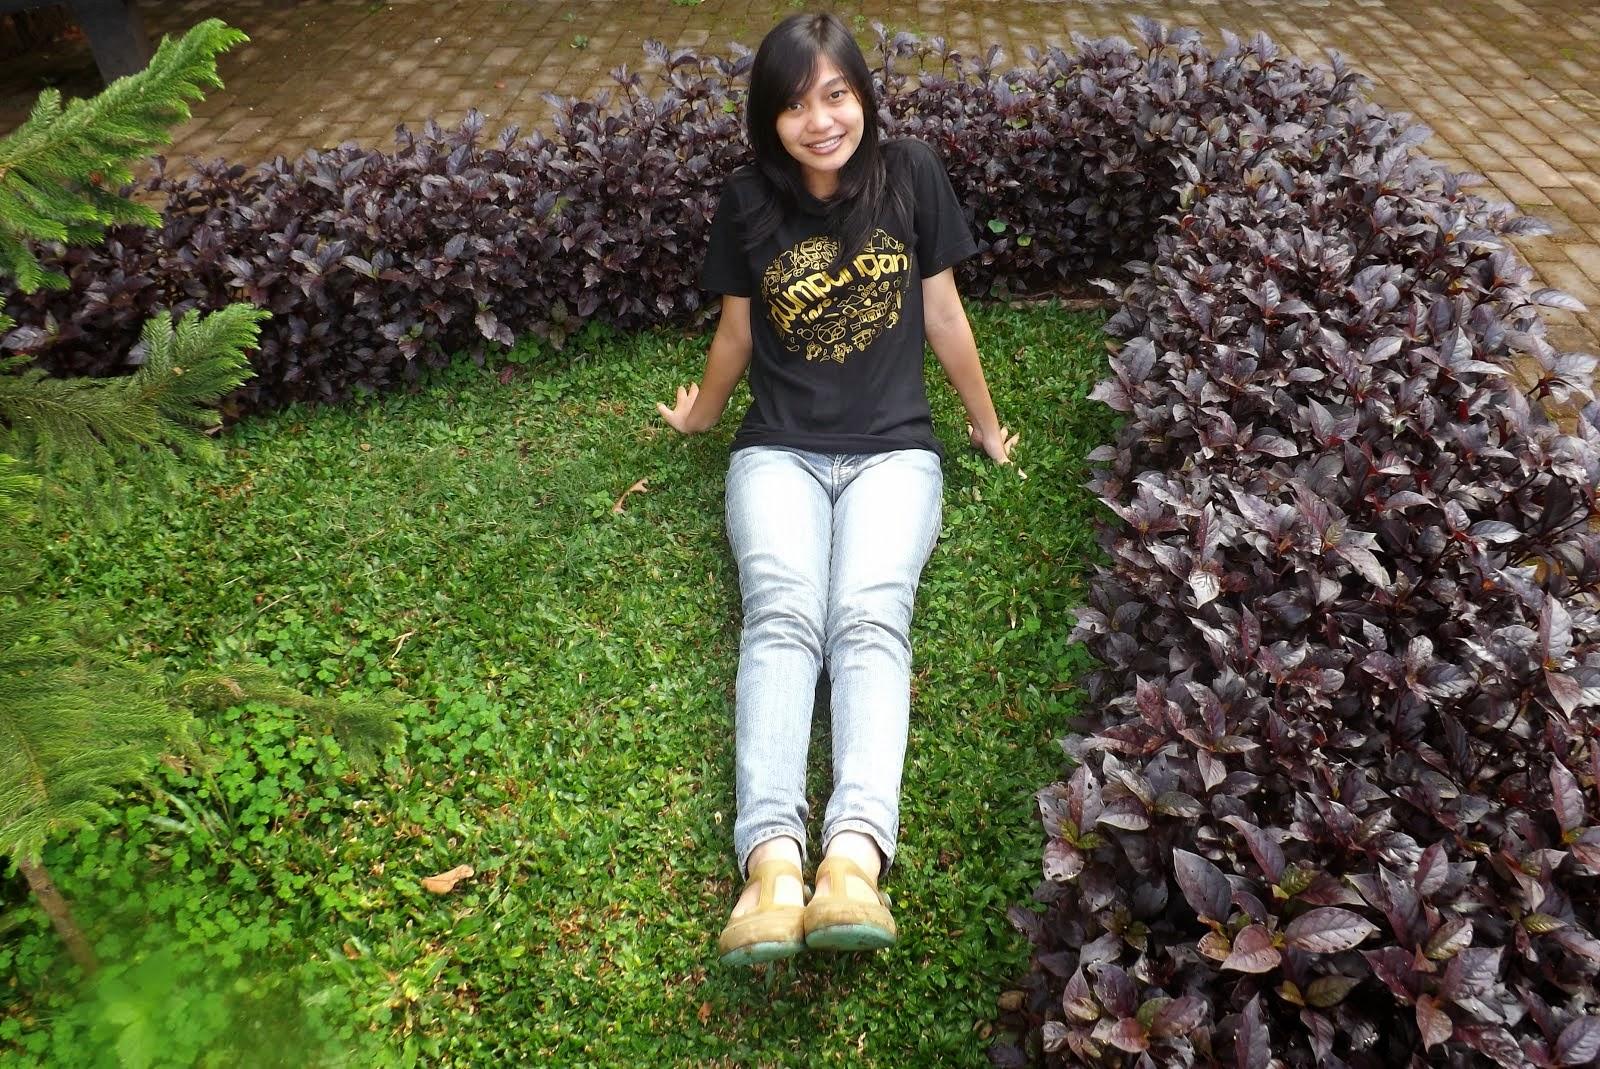 Galuh Widyastuti, Duta Anak Jawa Tengah Divisi Pendidikan 2013 dari Salatiga